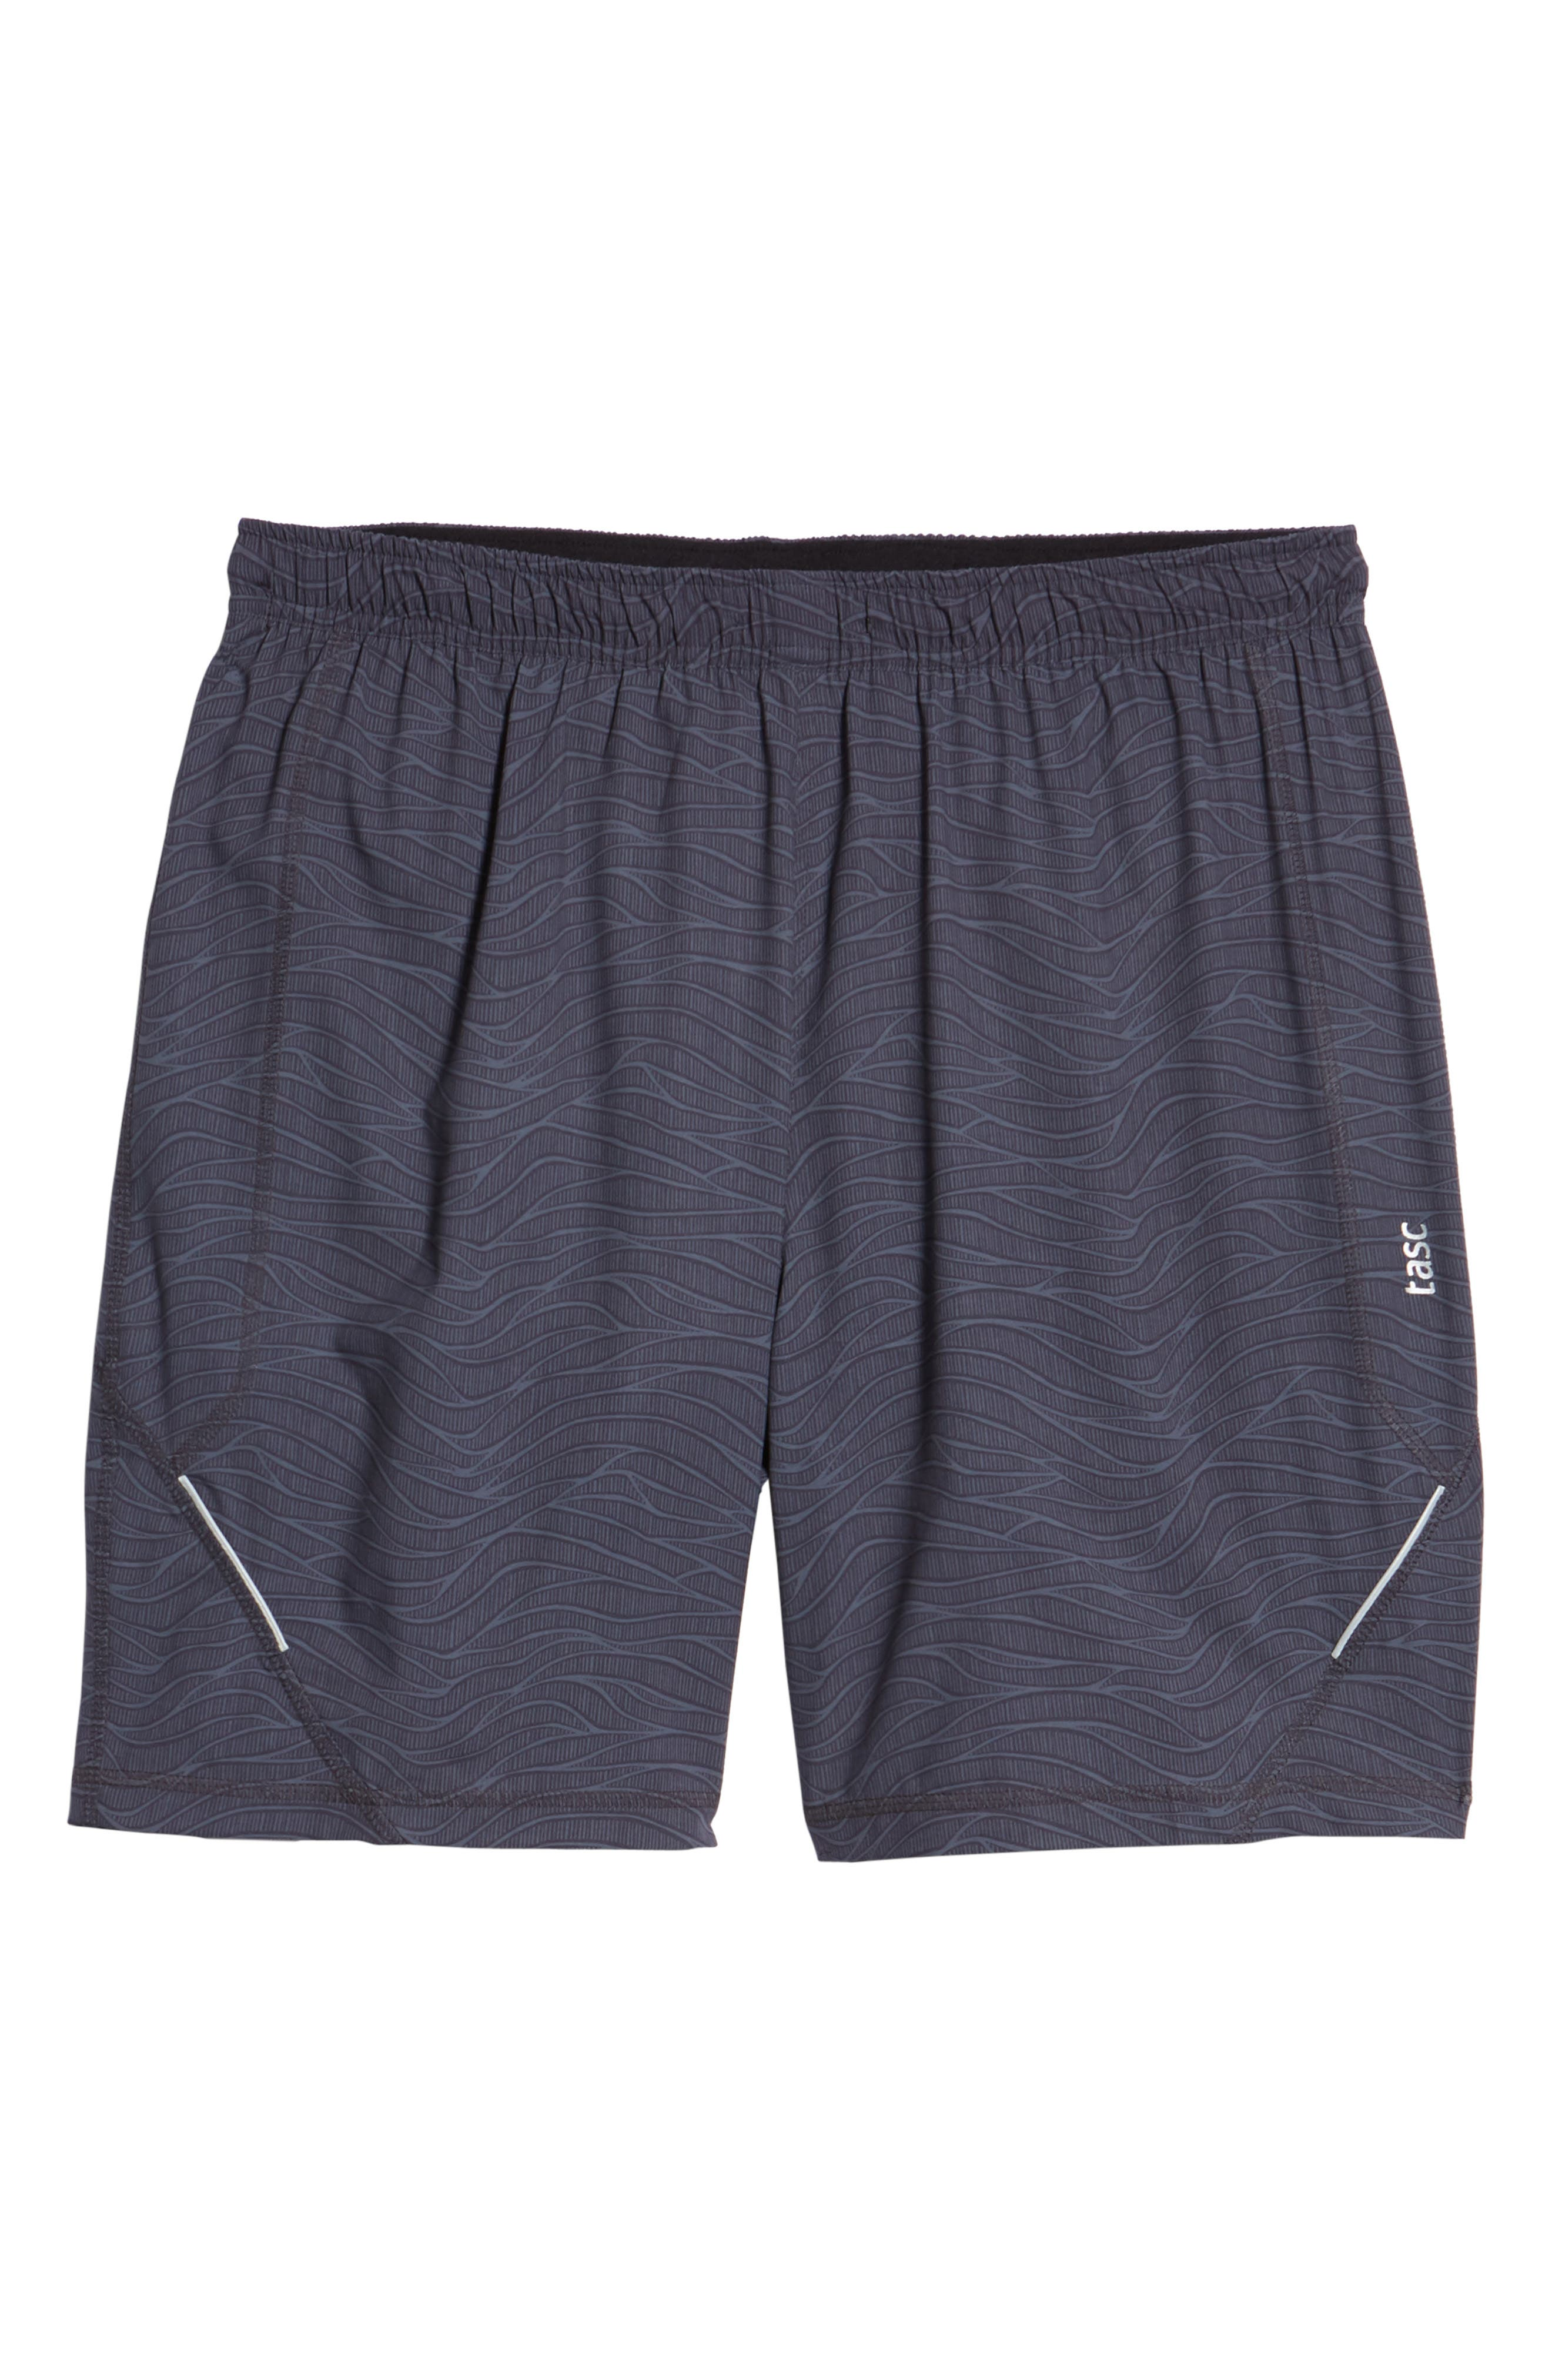 TASC PERFORMANCE, Propulsion Athletic Shorts, Alternate thumbnail 7, color, BLACK SONIC WAVE